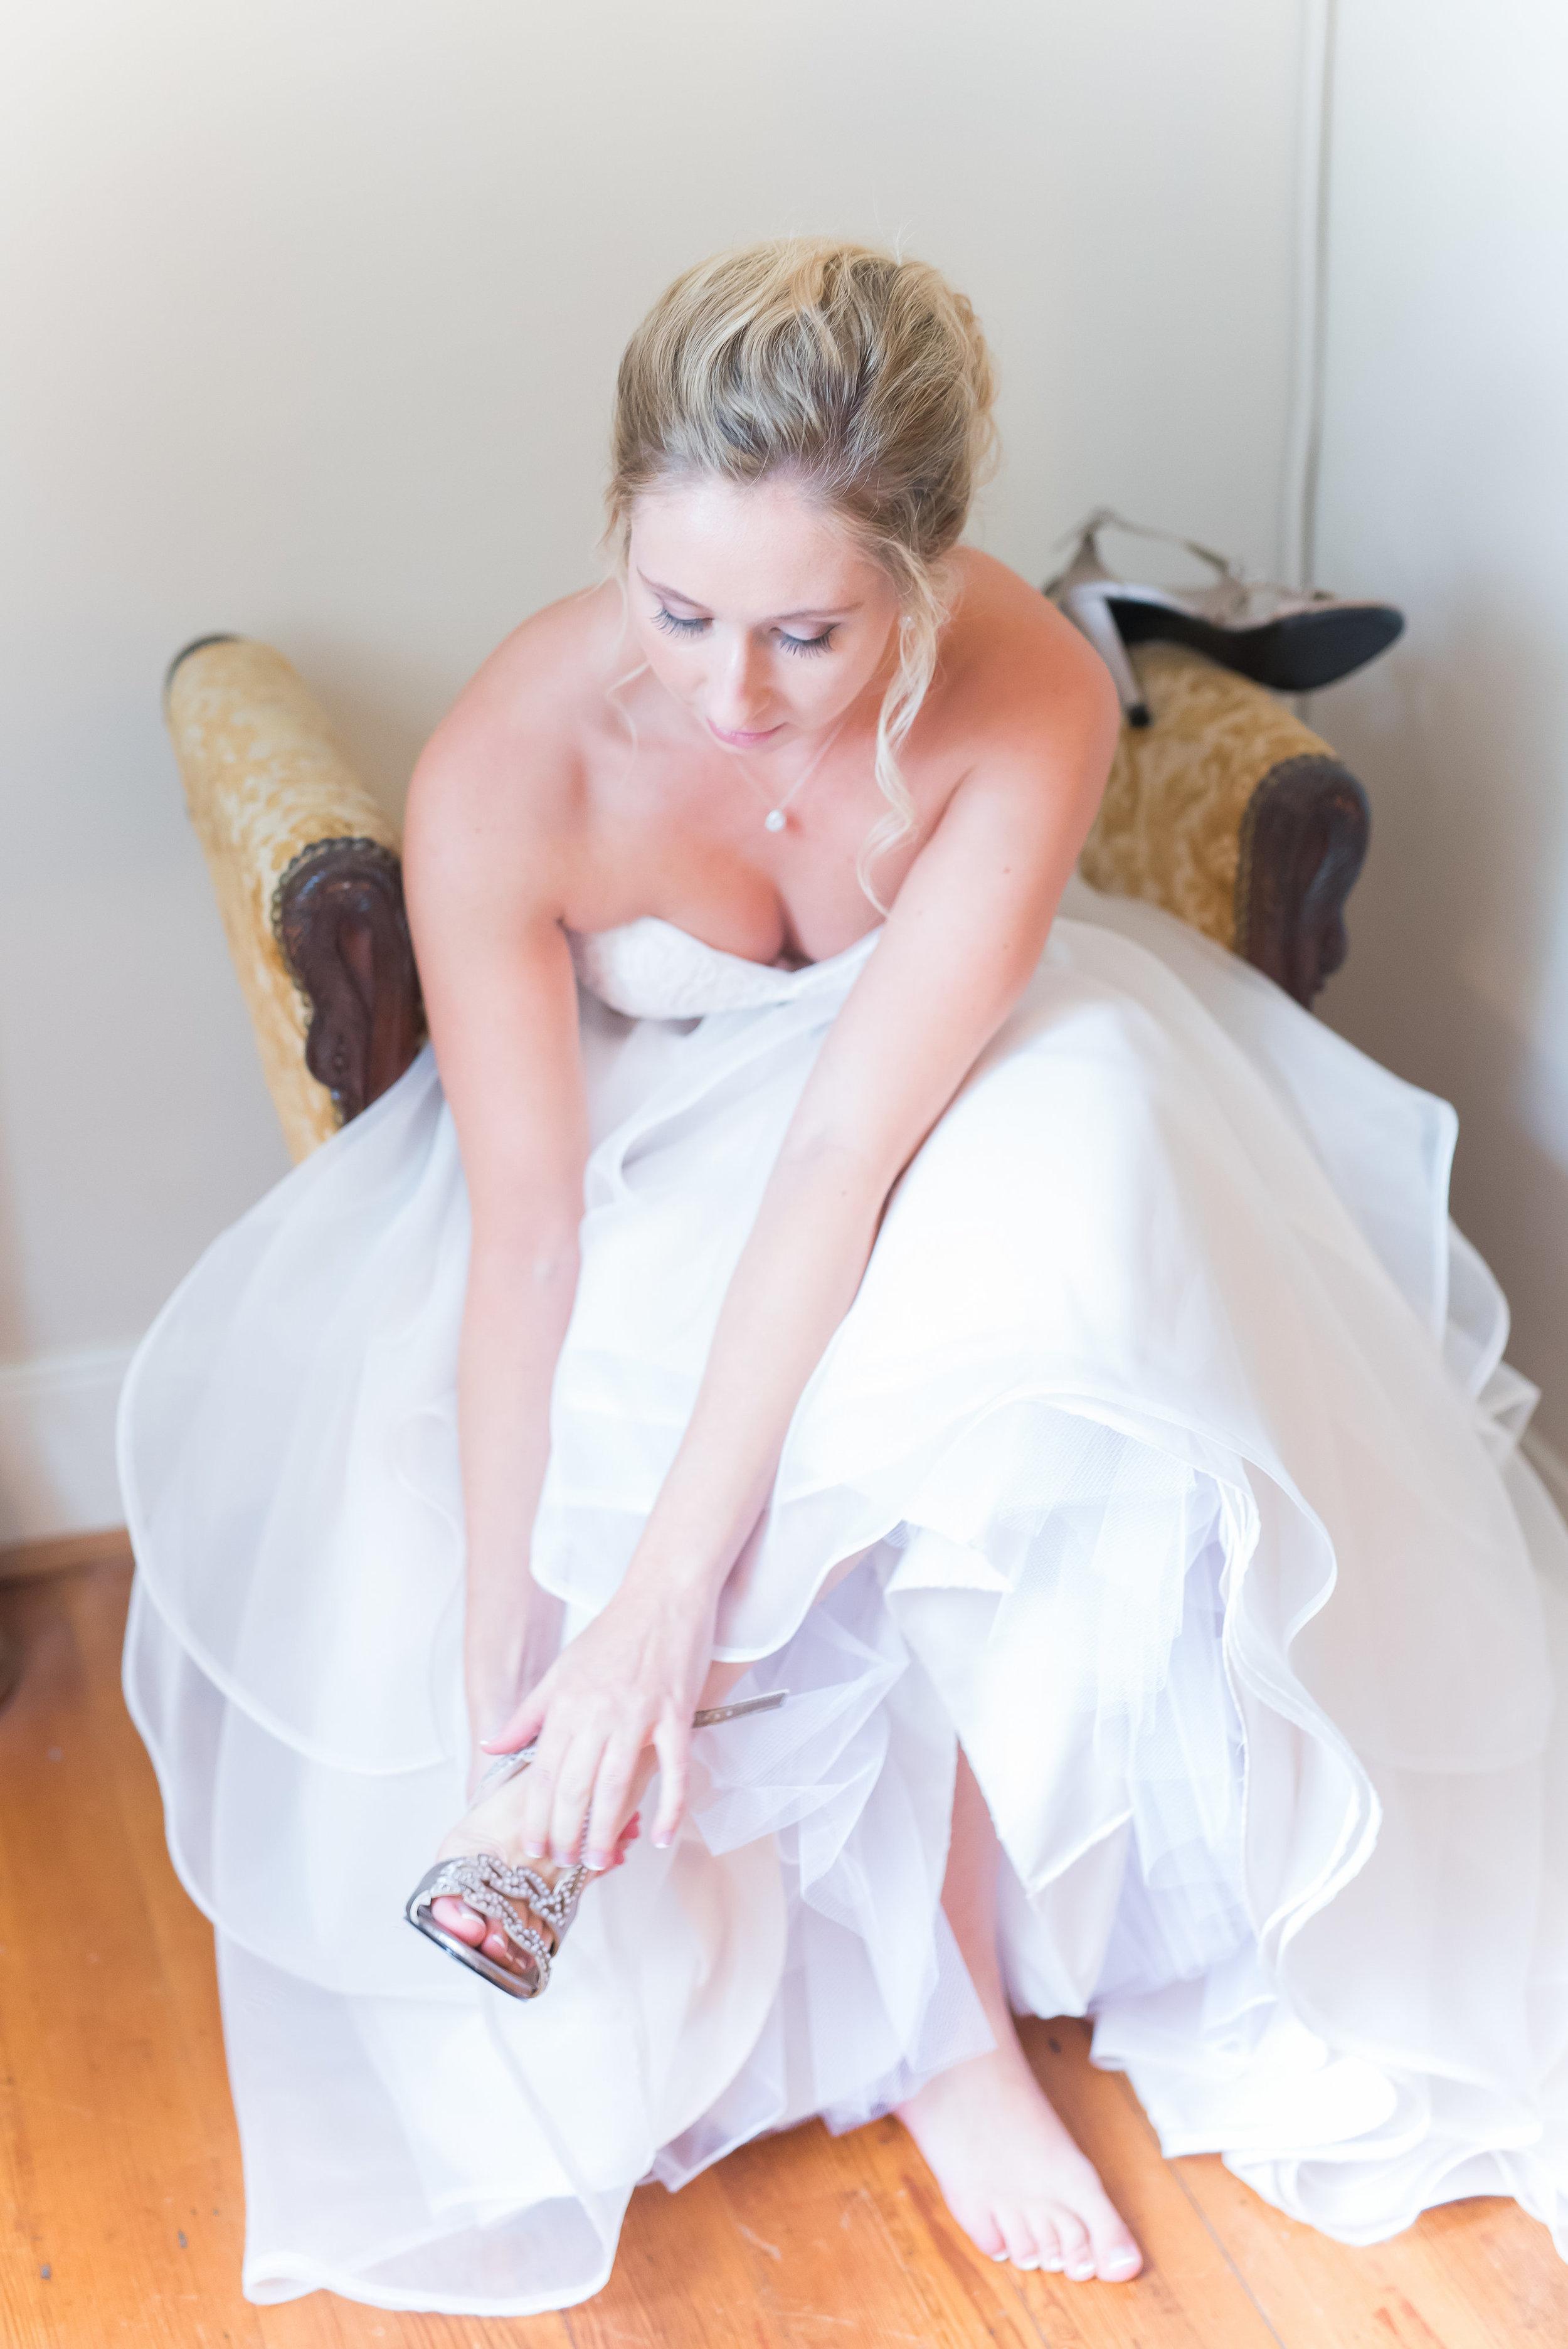 090117 MD Jocelyn Butrum - Ruthie Skillman Photography JBag LC-177.jpg